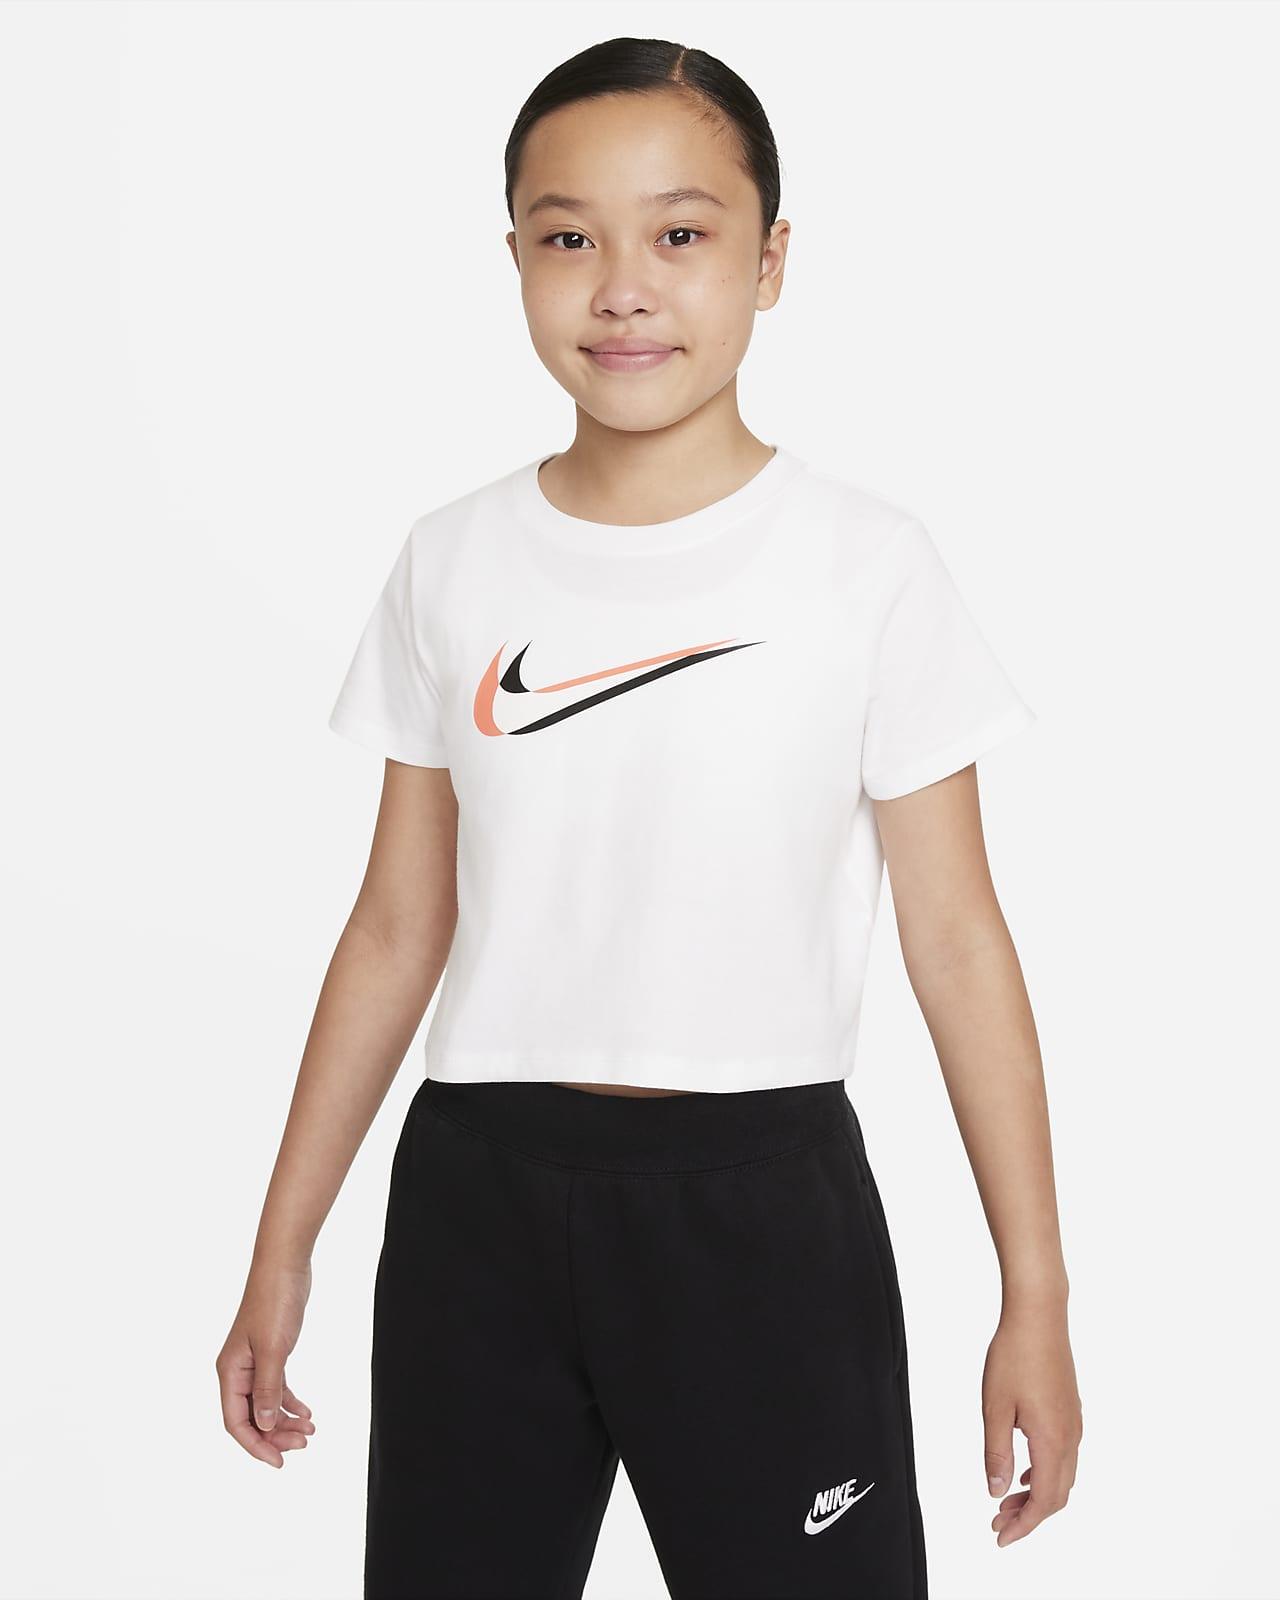 T-shirt de dança recortada Nike Sportswear Júnior (Rapariga)